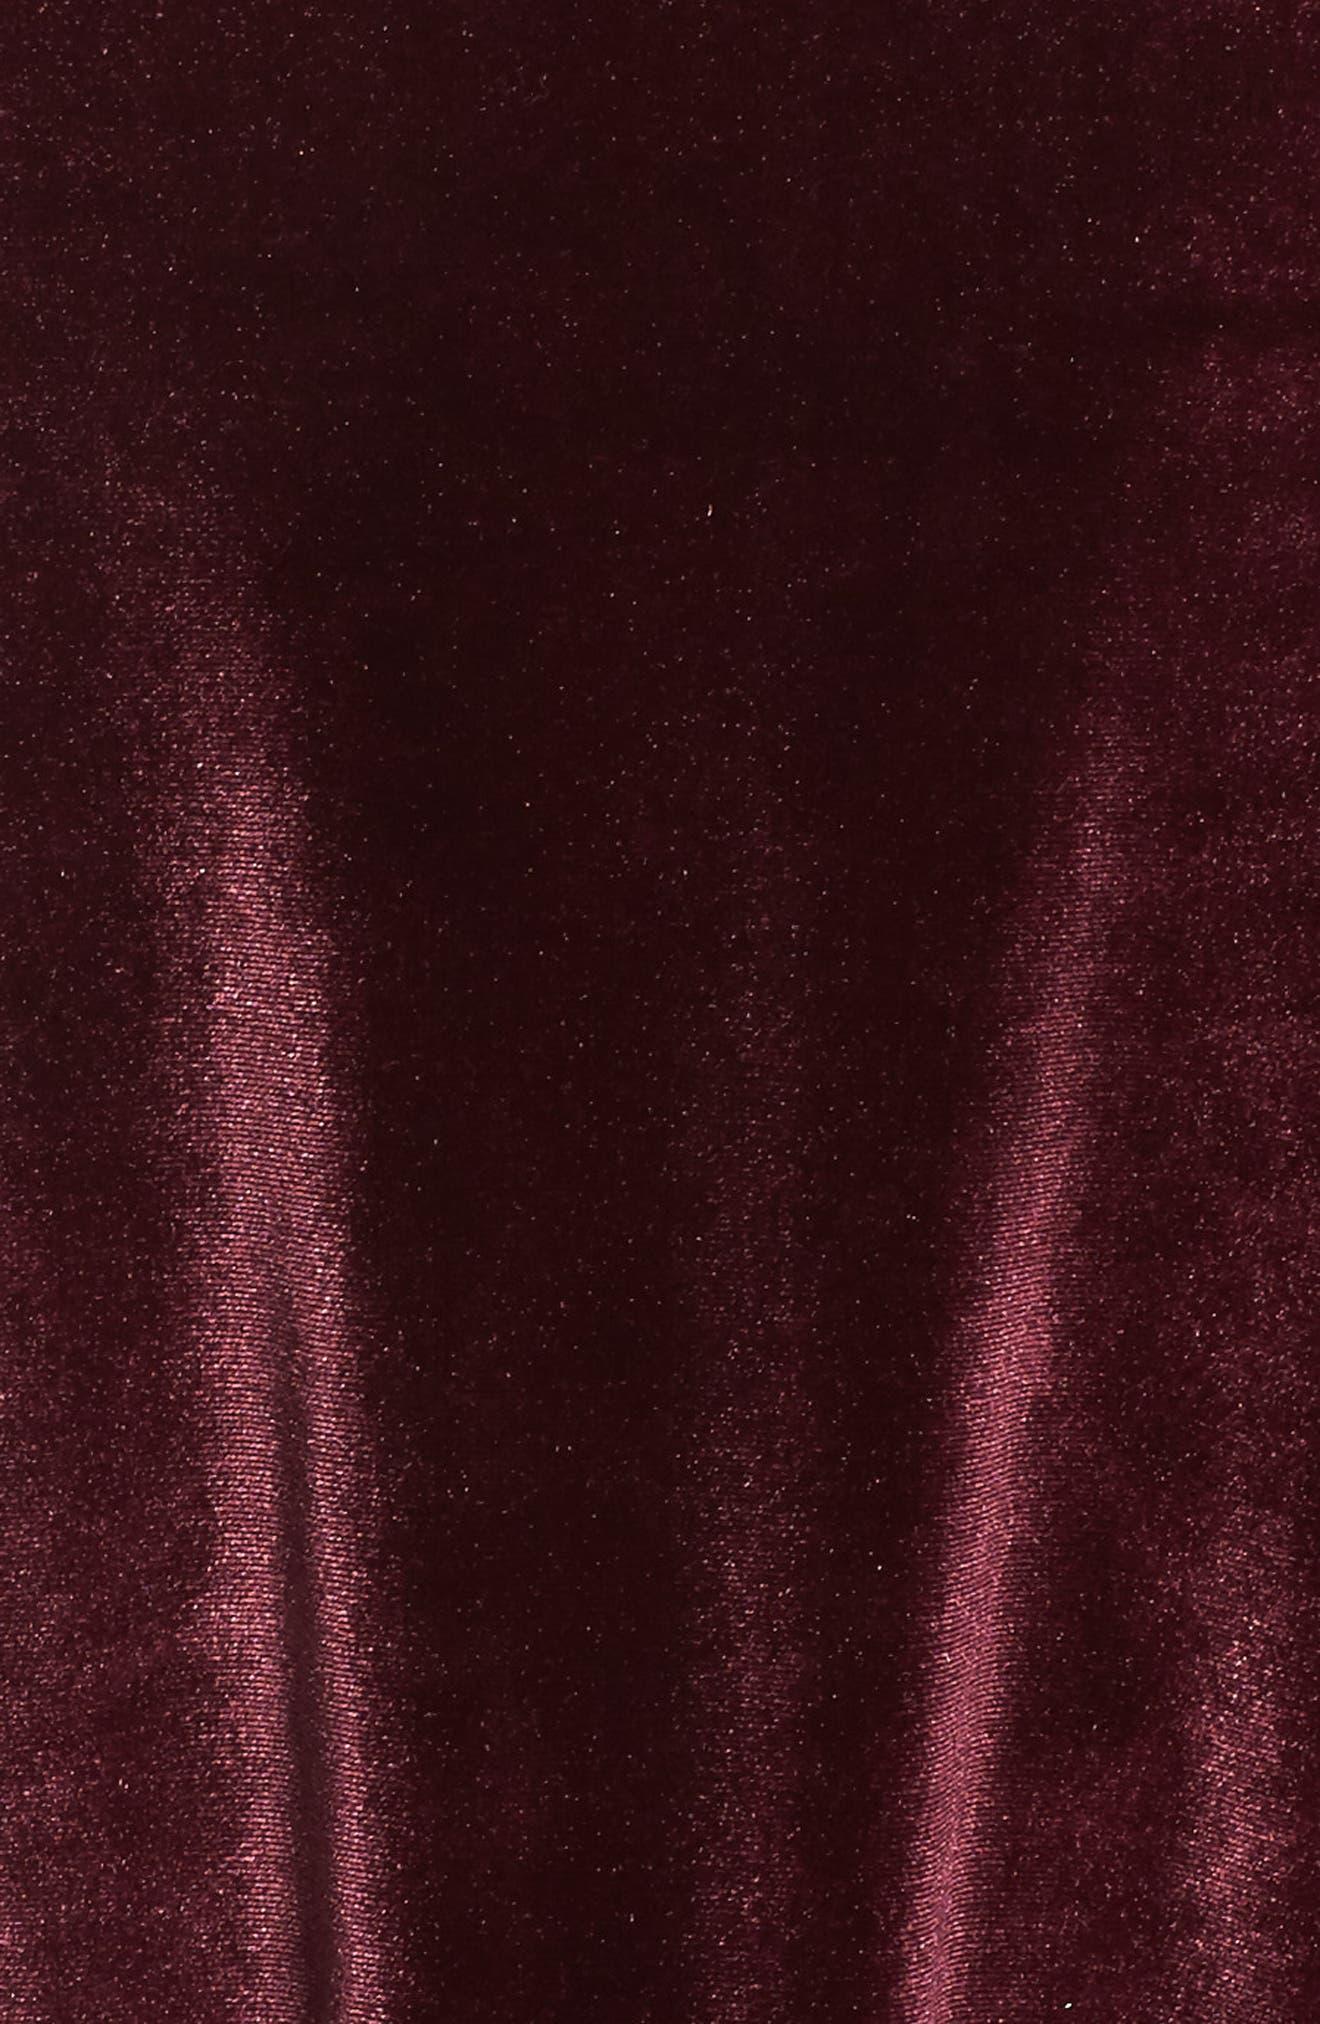 Cowl Neck Velour Top,                             Alternate thumbnail 5, color,                             Burgundy Stem